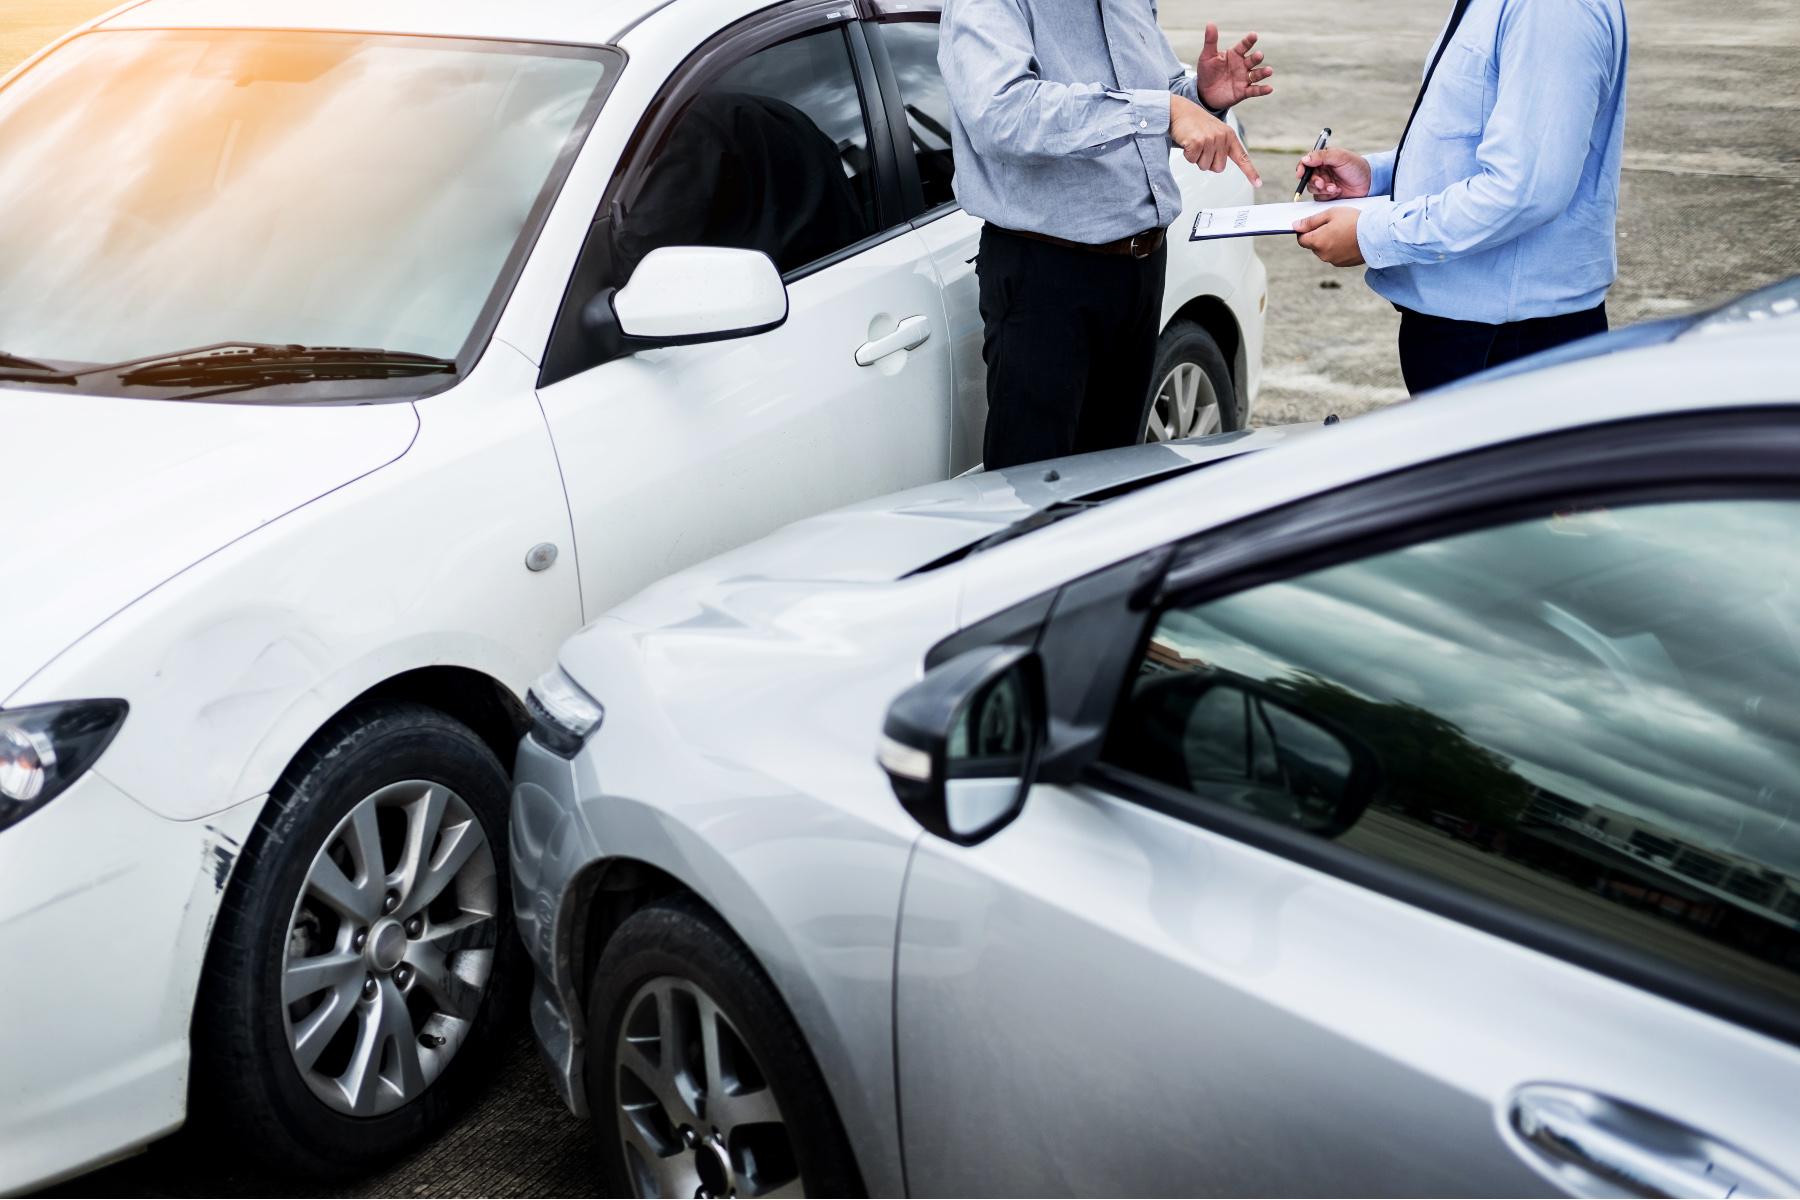 Drivers exchanging insurance details after a car crash